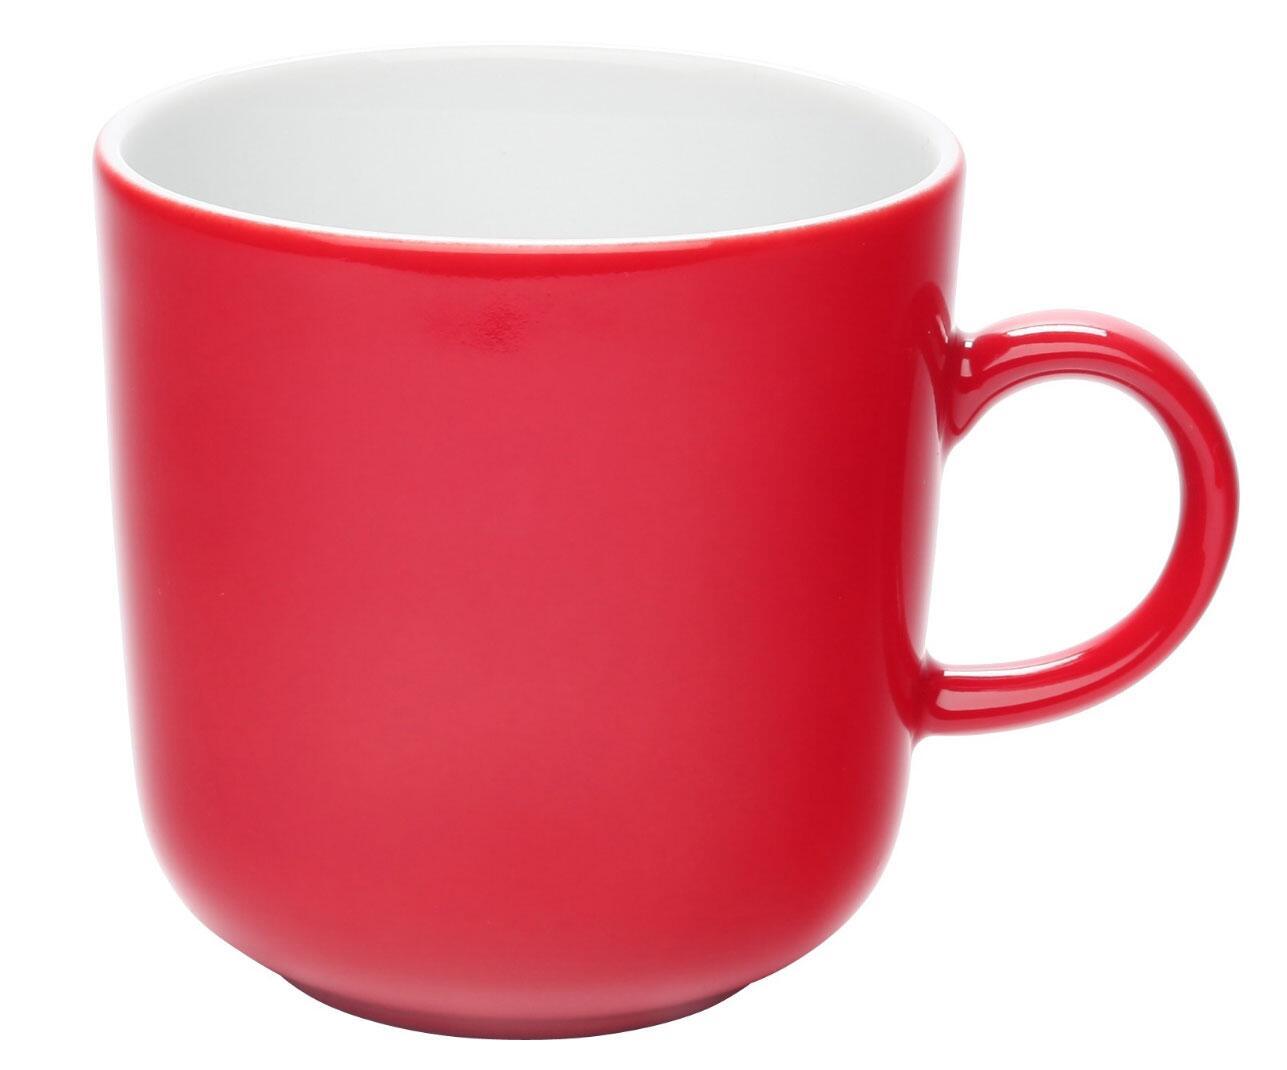 Kahla Pronto Kaffeebecher 0,30 l rot